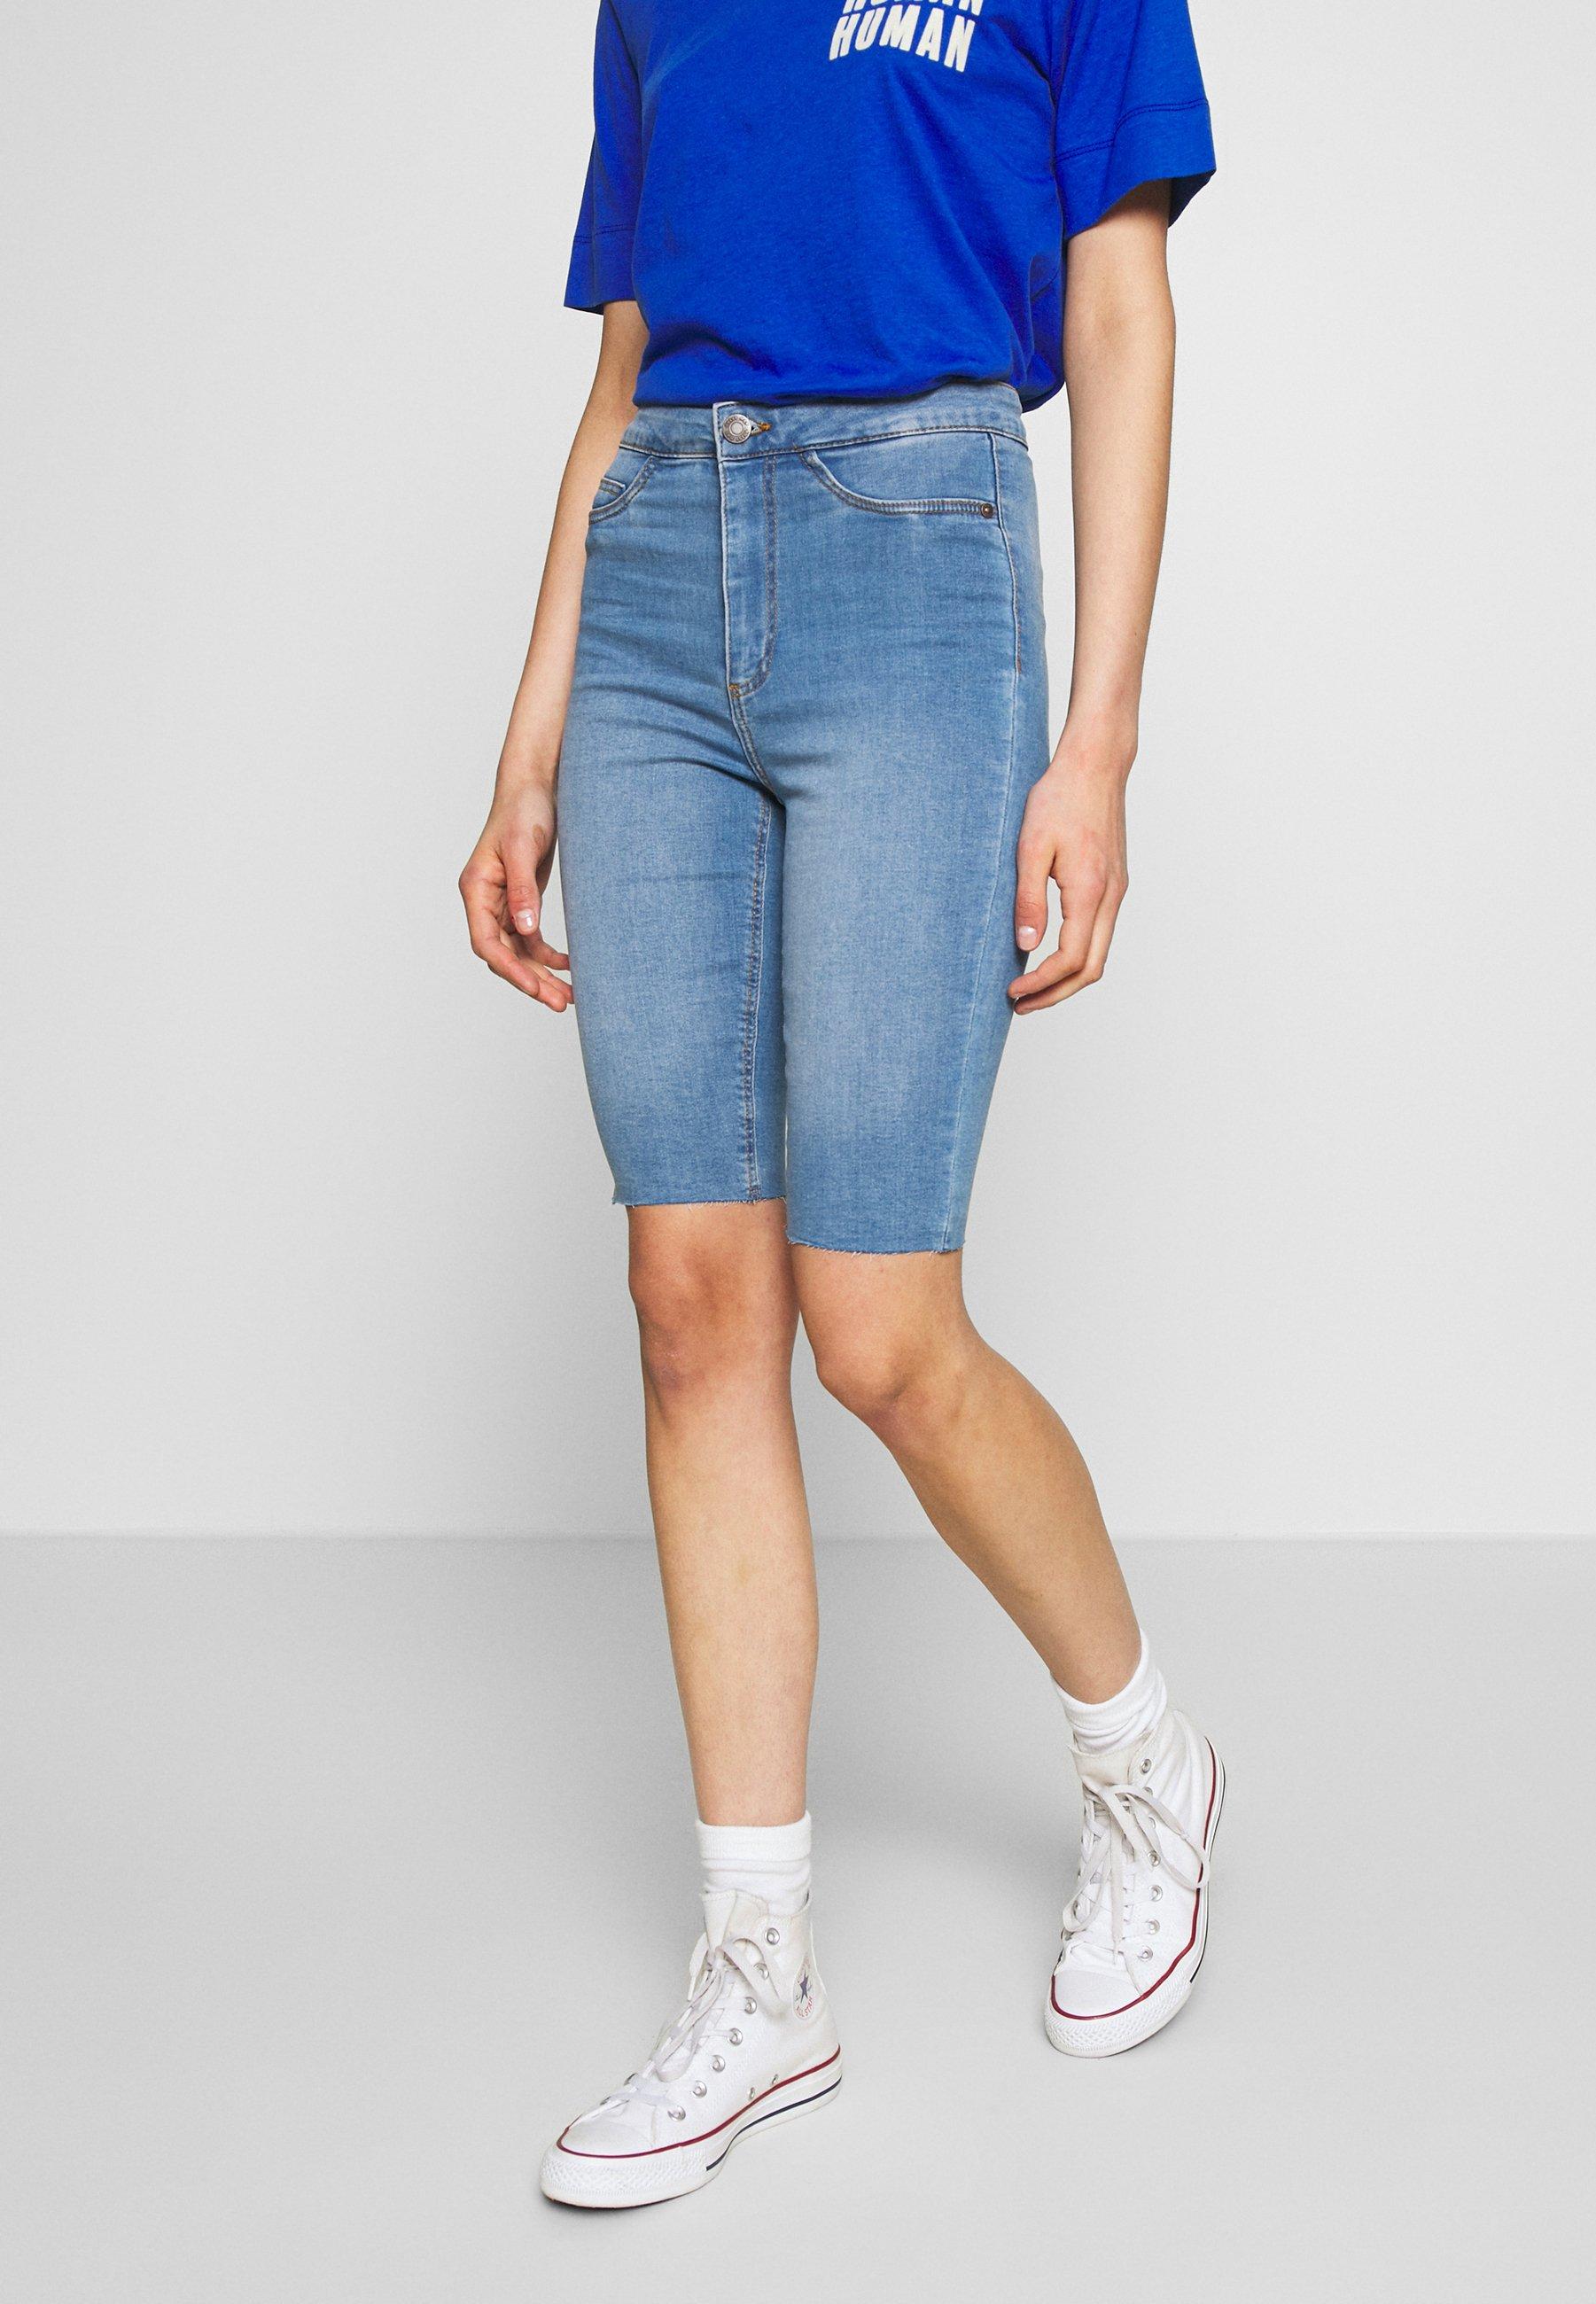 Damer NMBE CALLIE - Jeans Short / cowboy shorts